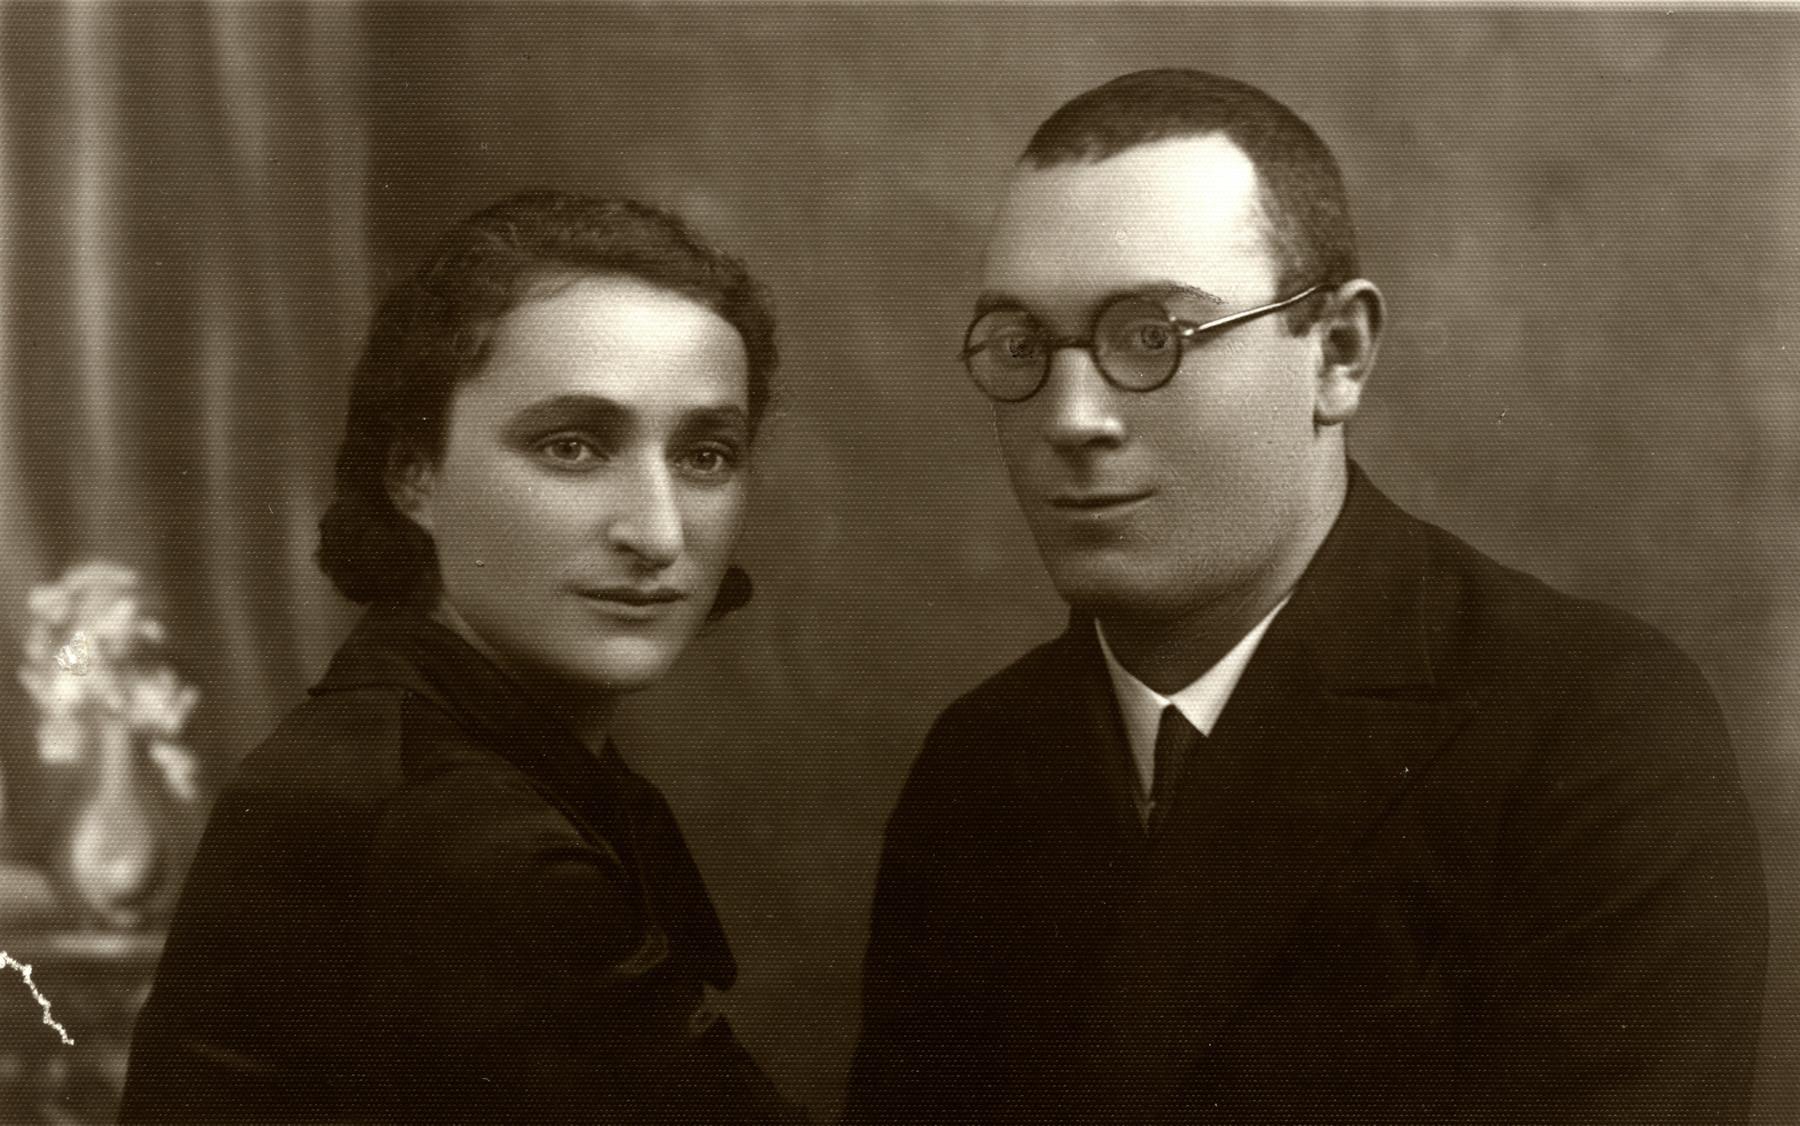 Studio portrait of Israel Kaplan and Leah Greenstein taken shortly around their wedding day.